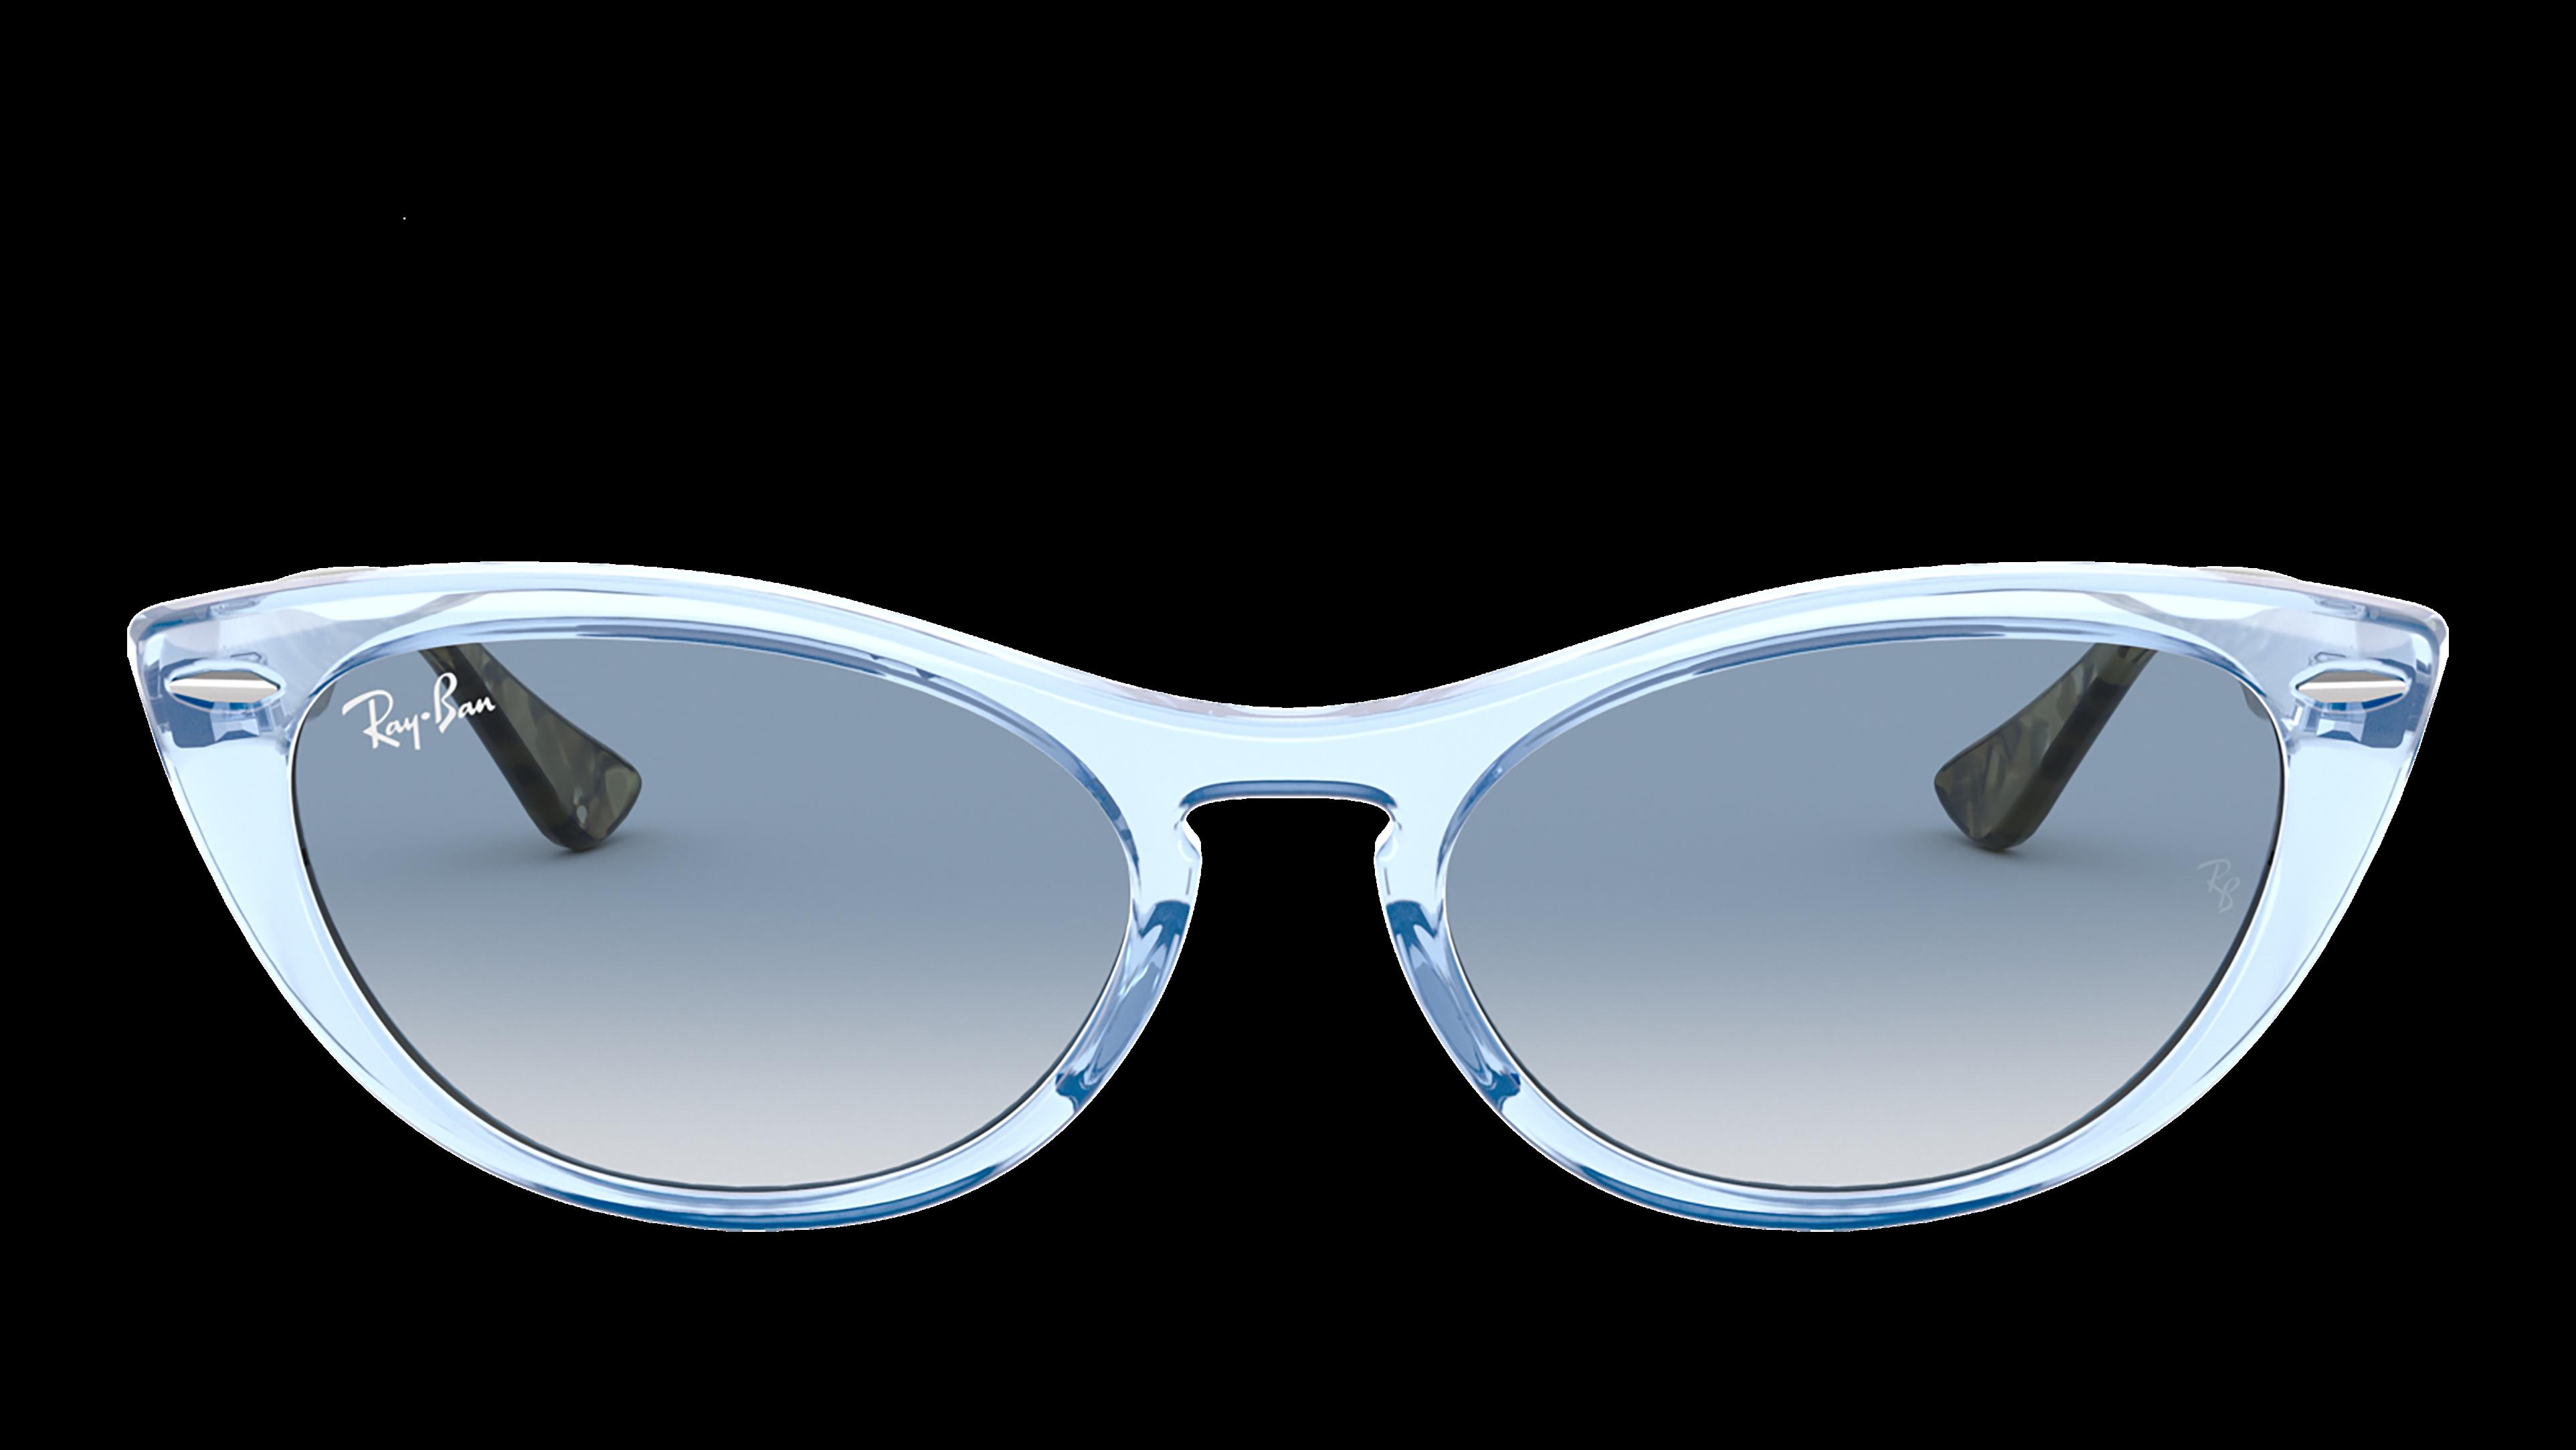 Front Ray-Ban Ray-Ban 0RB4314N 12833F 54/18 Blauw, Transparant/Blauw